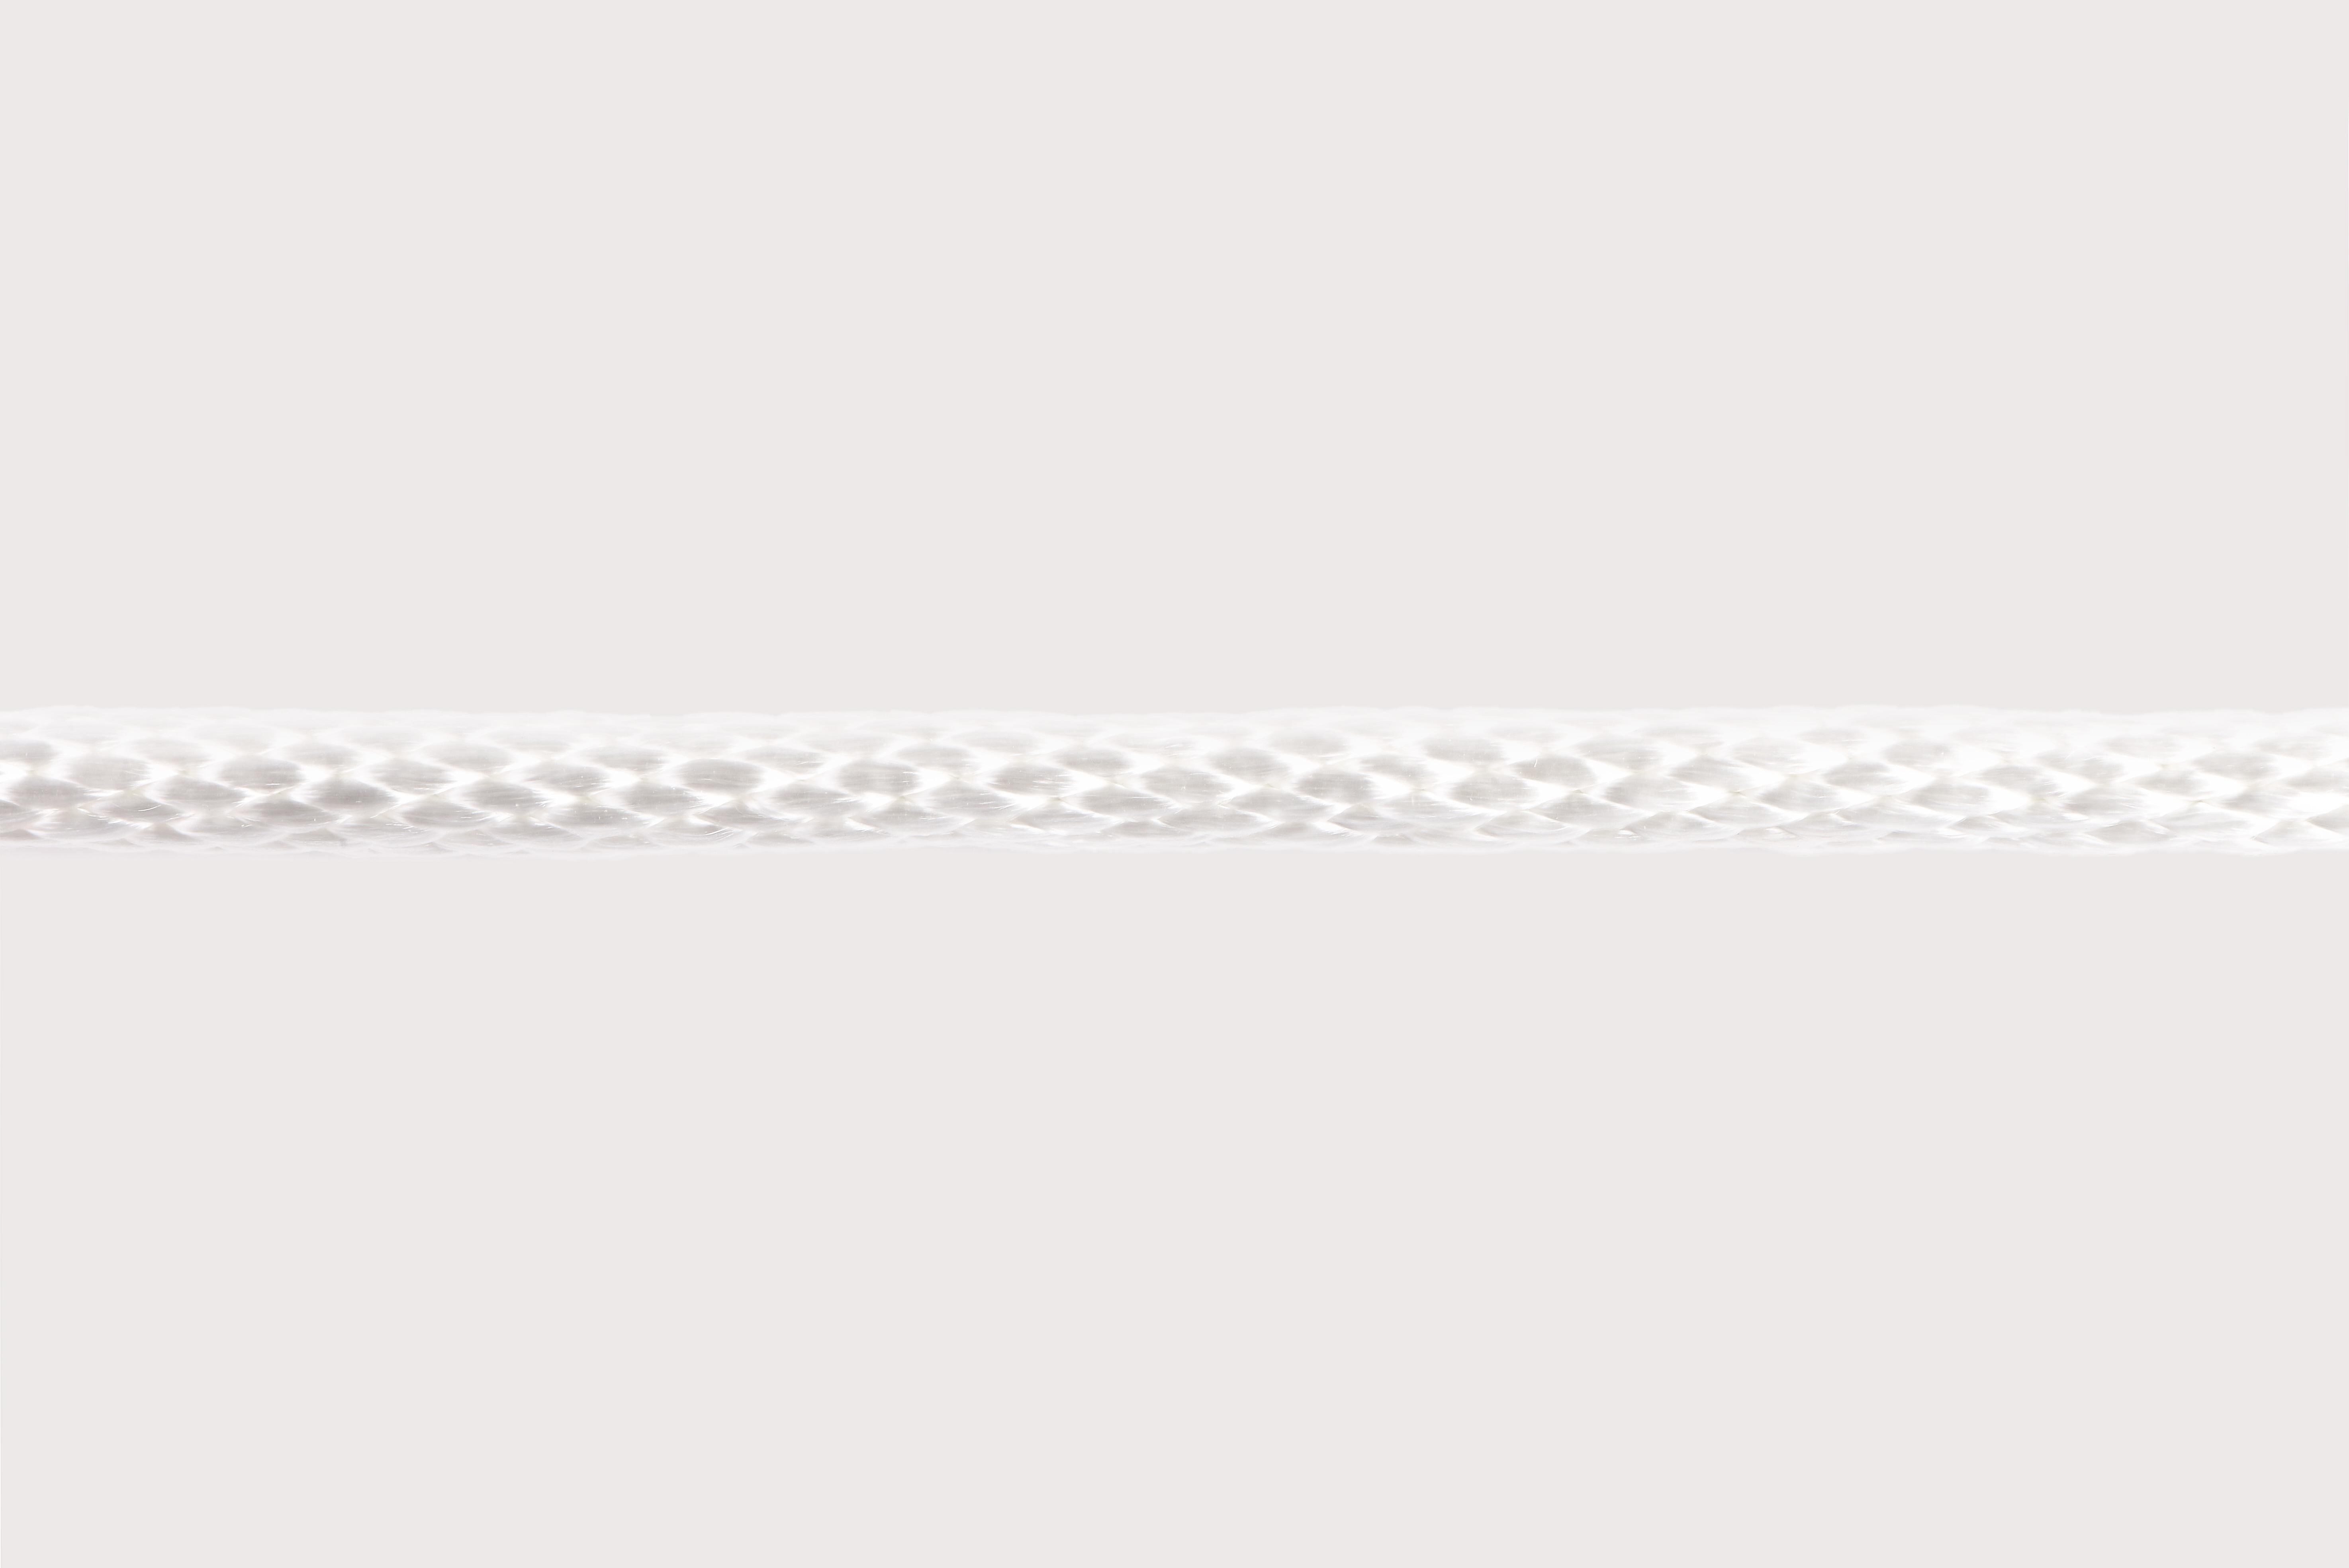 Orion-Cordage-Solid Braid Nylon-White-Horizontal62.jpg